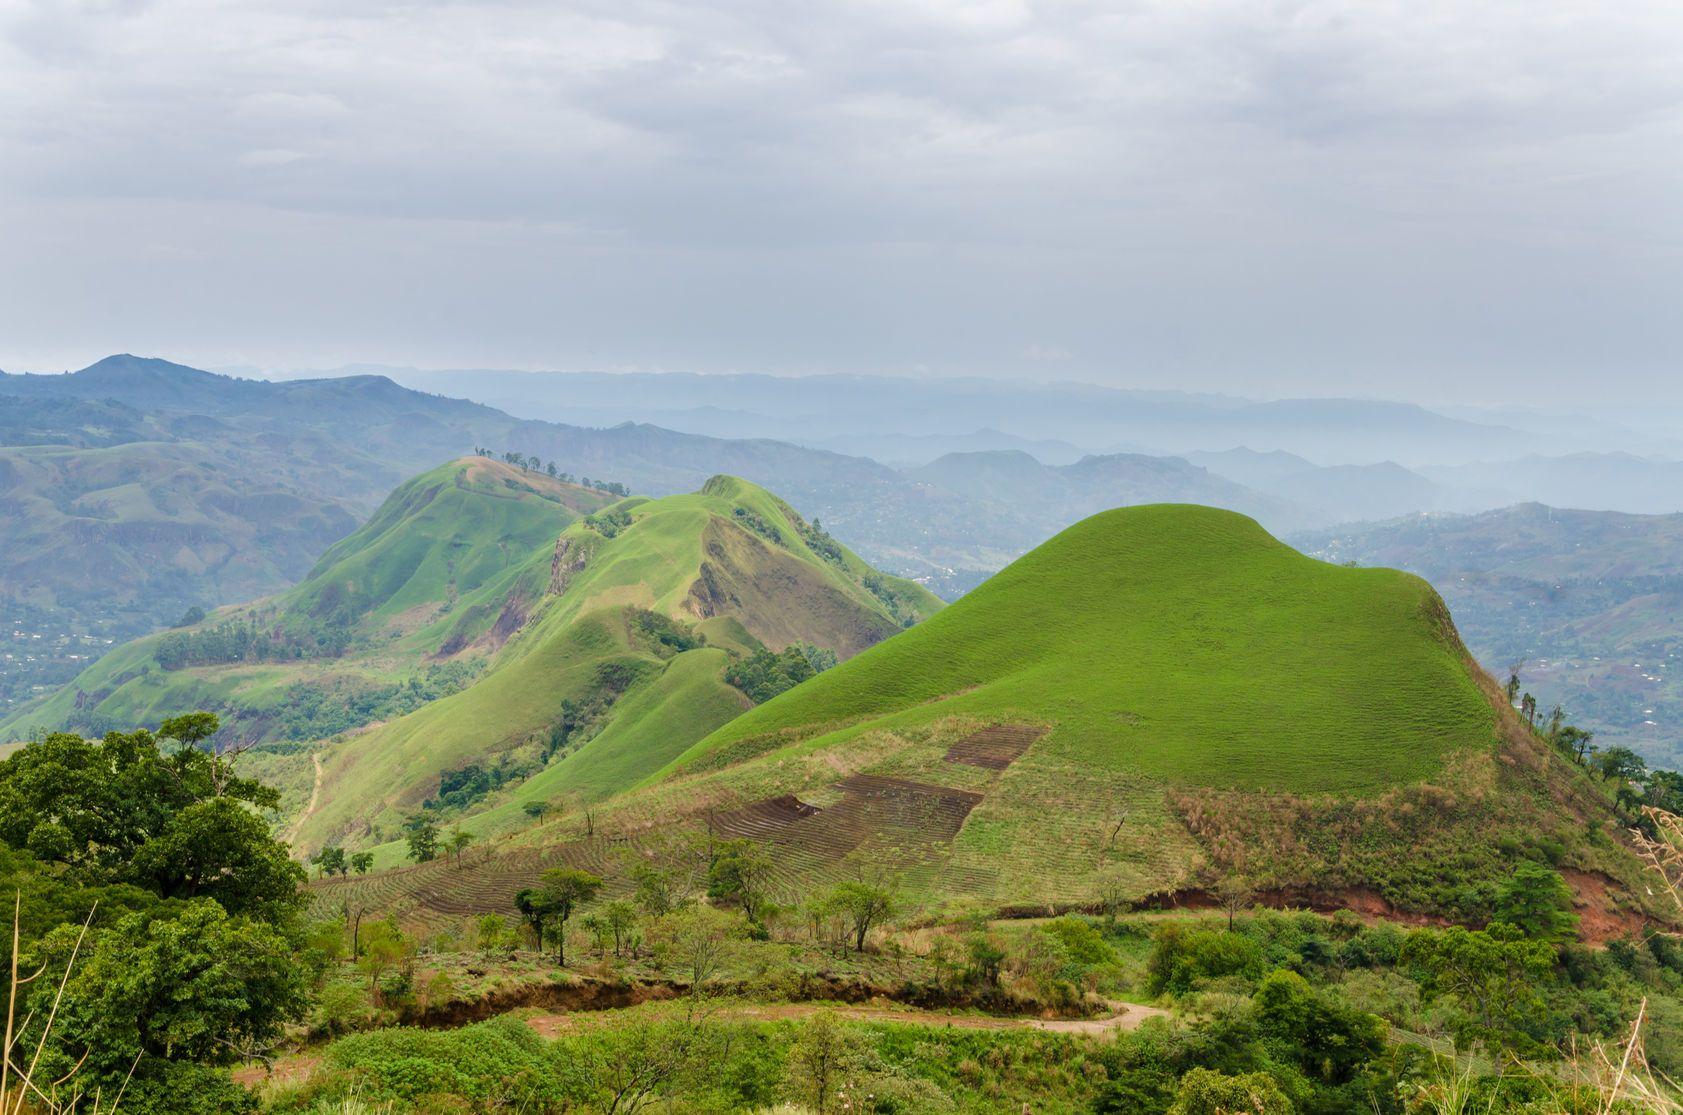 Horská krajina v Kamerunu   wootan51/123RF.com